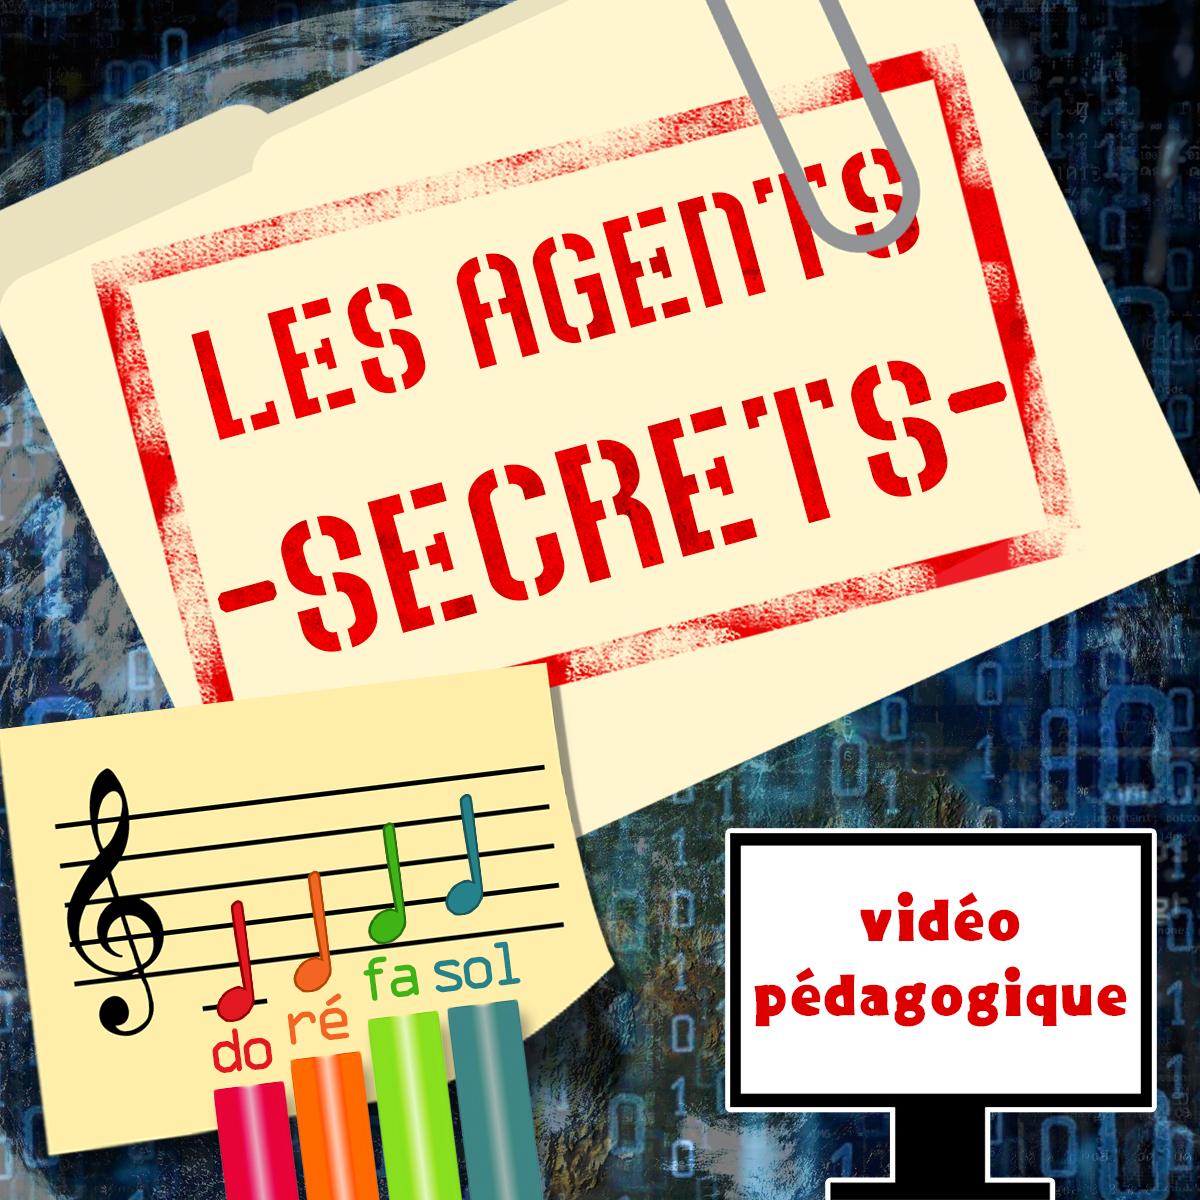 Les agents secrets